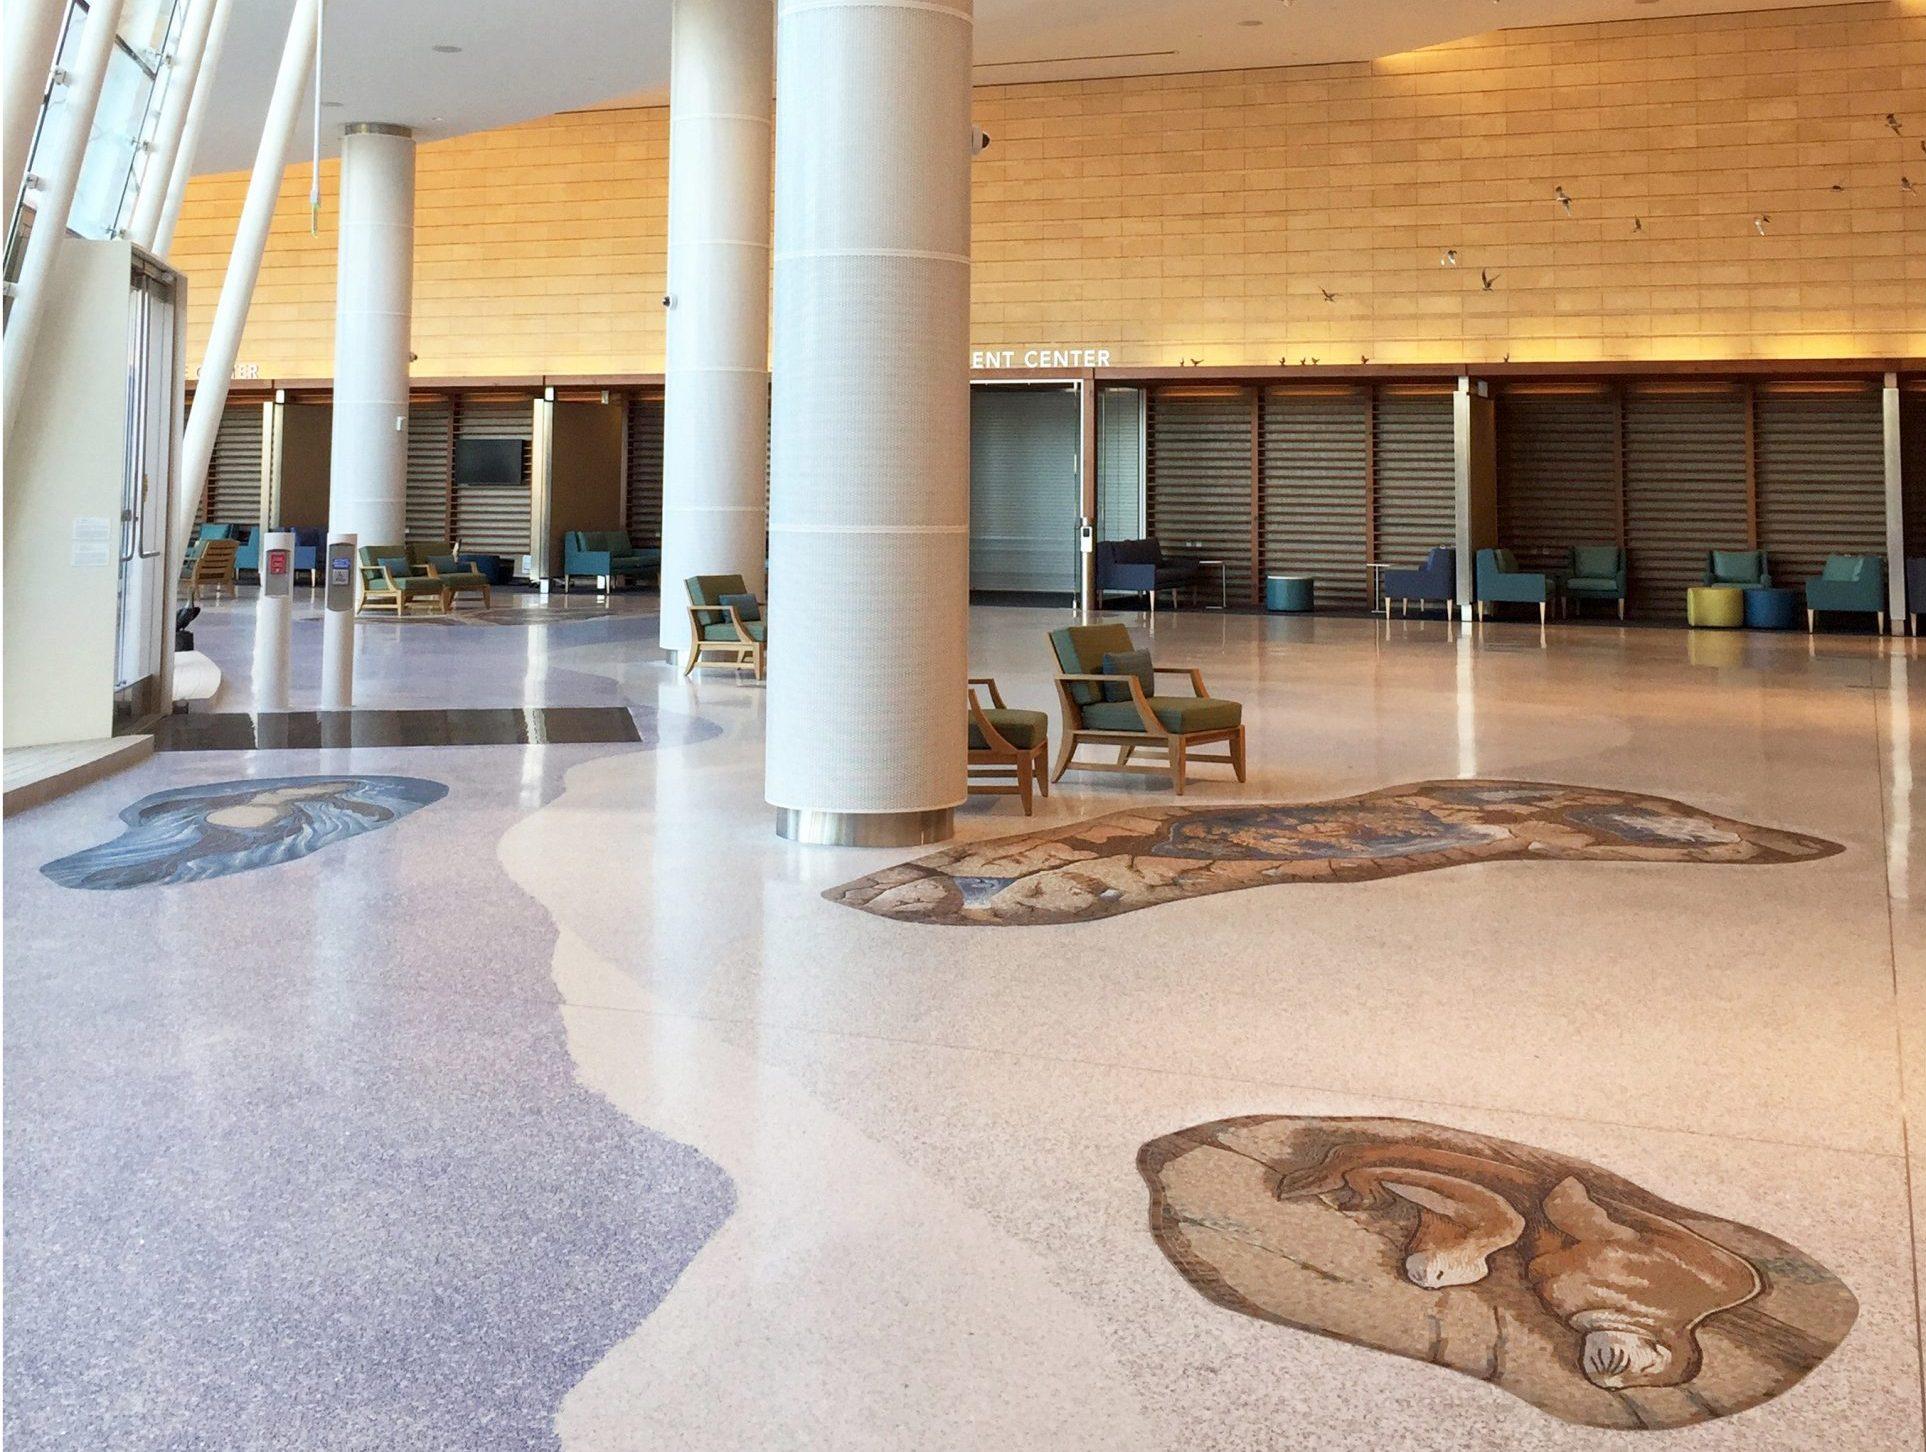 LPCH Lobby View